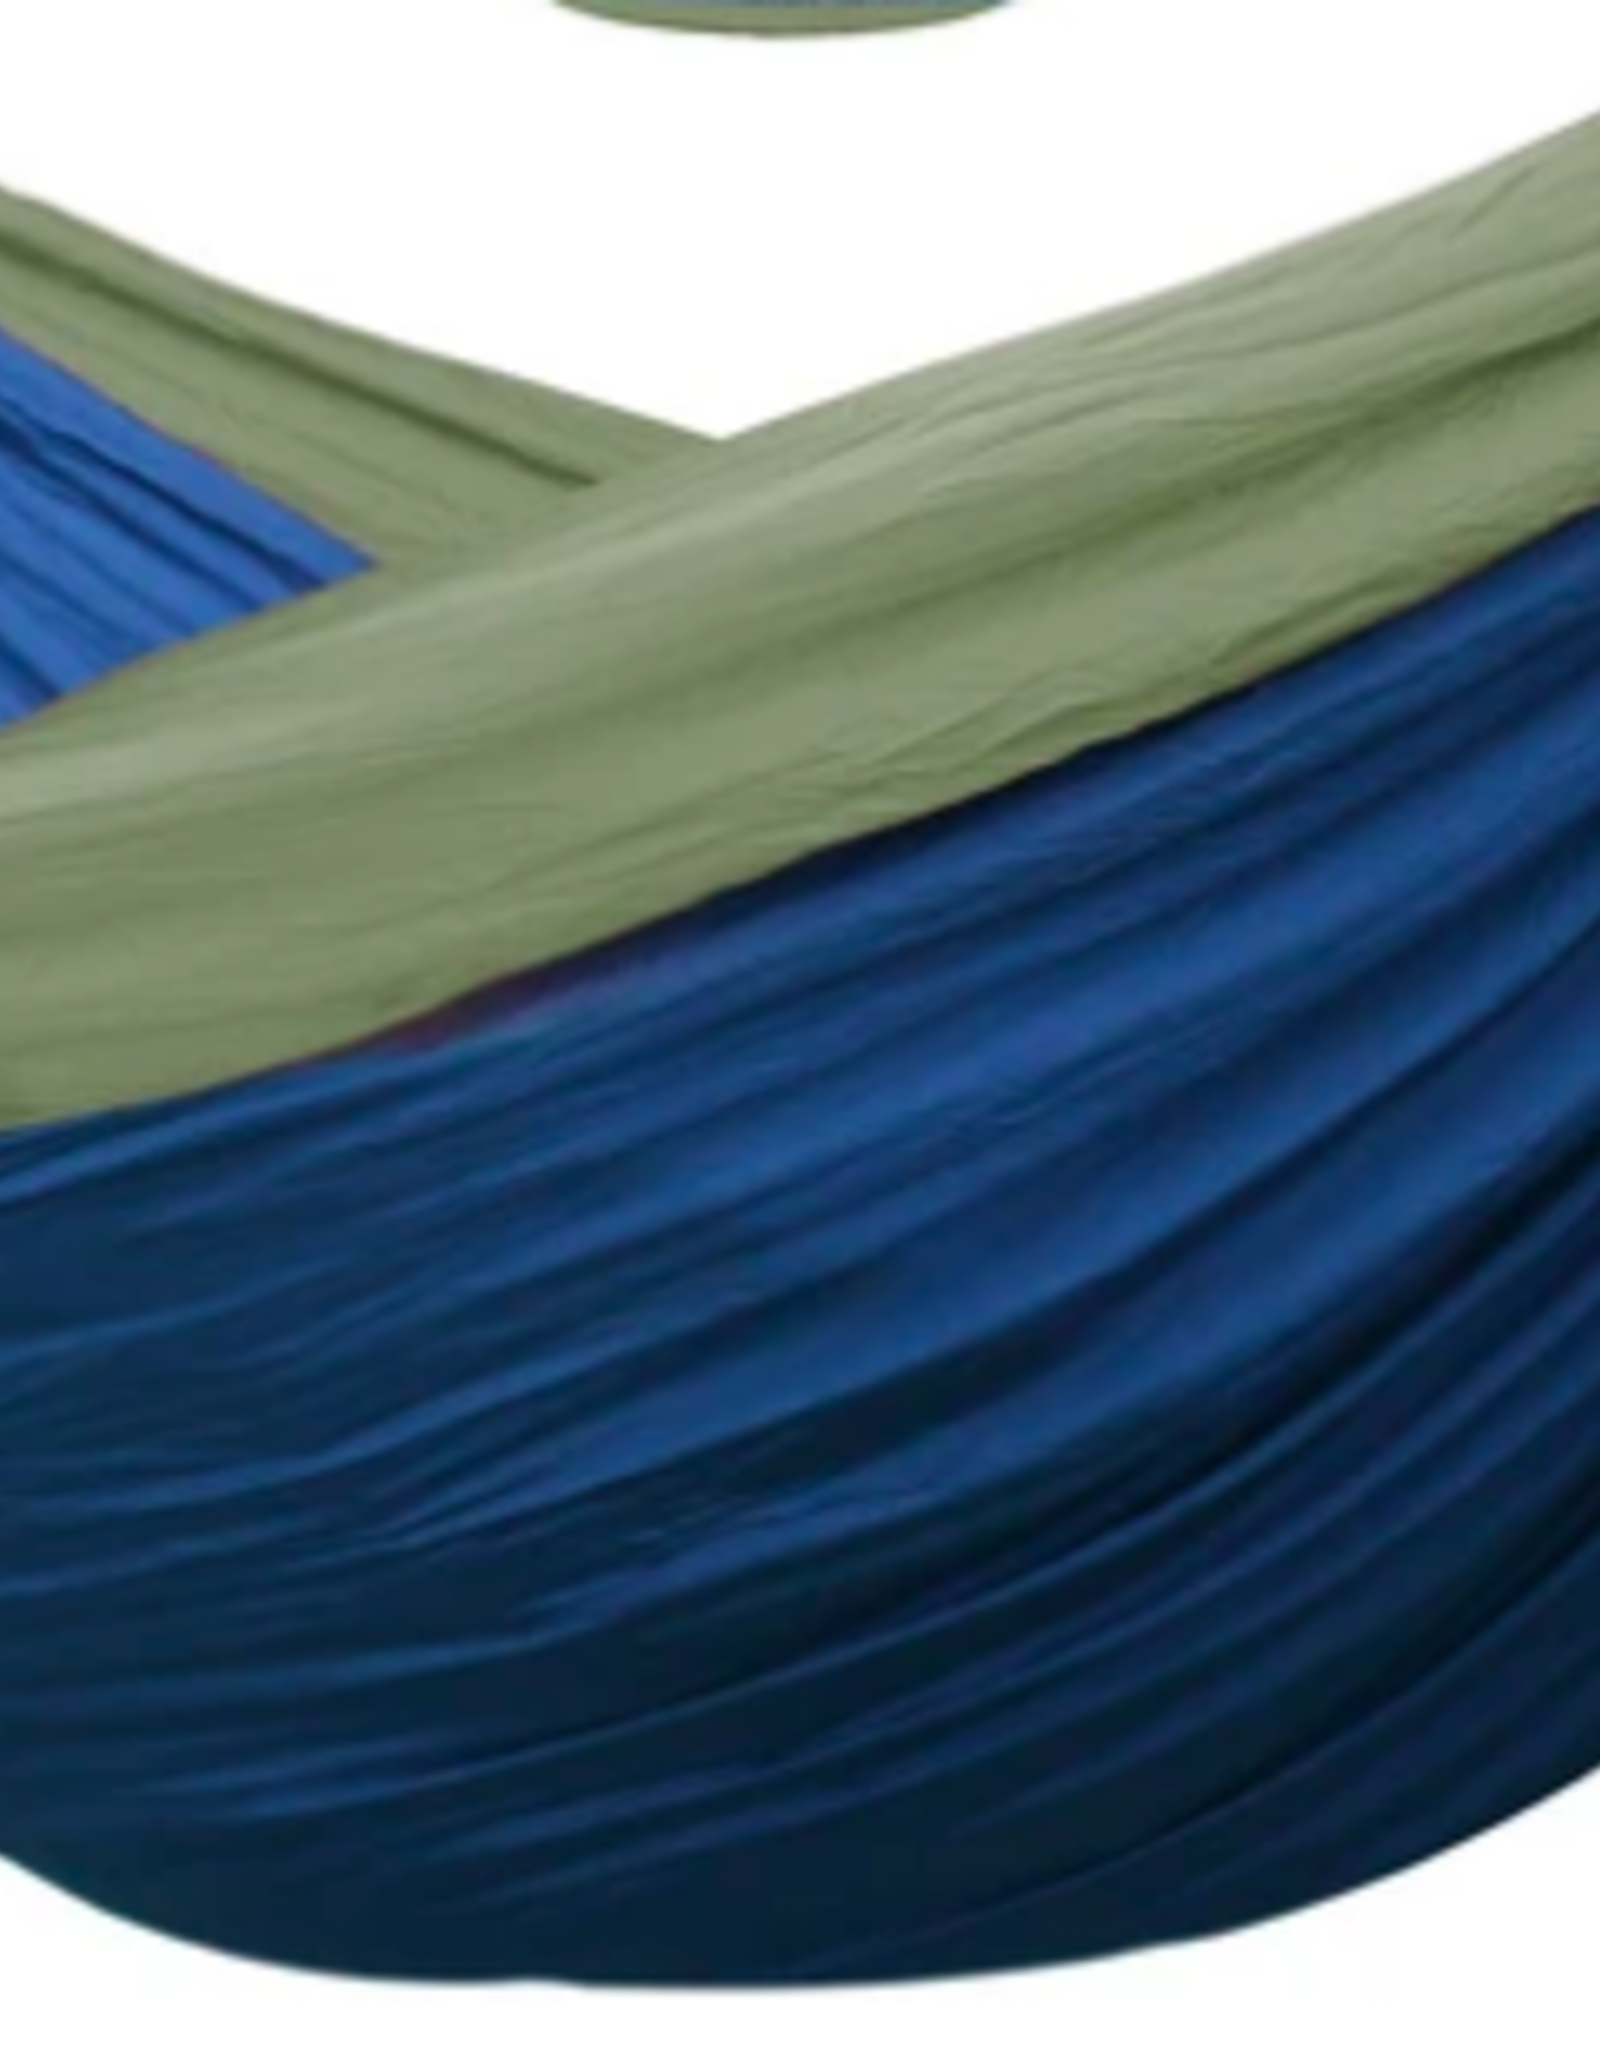 Hammock Vivere Parachute Double Navy / Olive 21